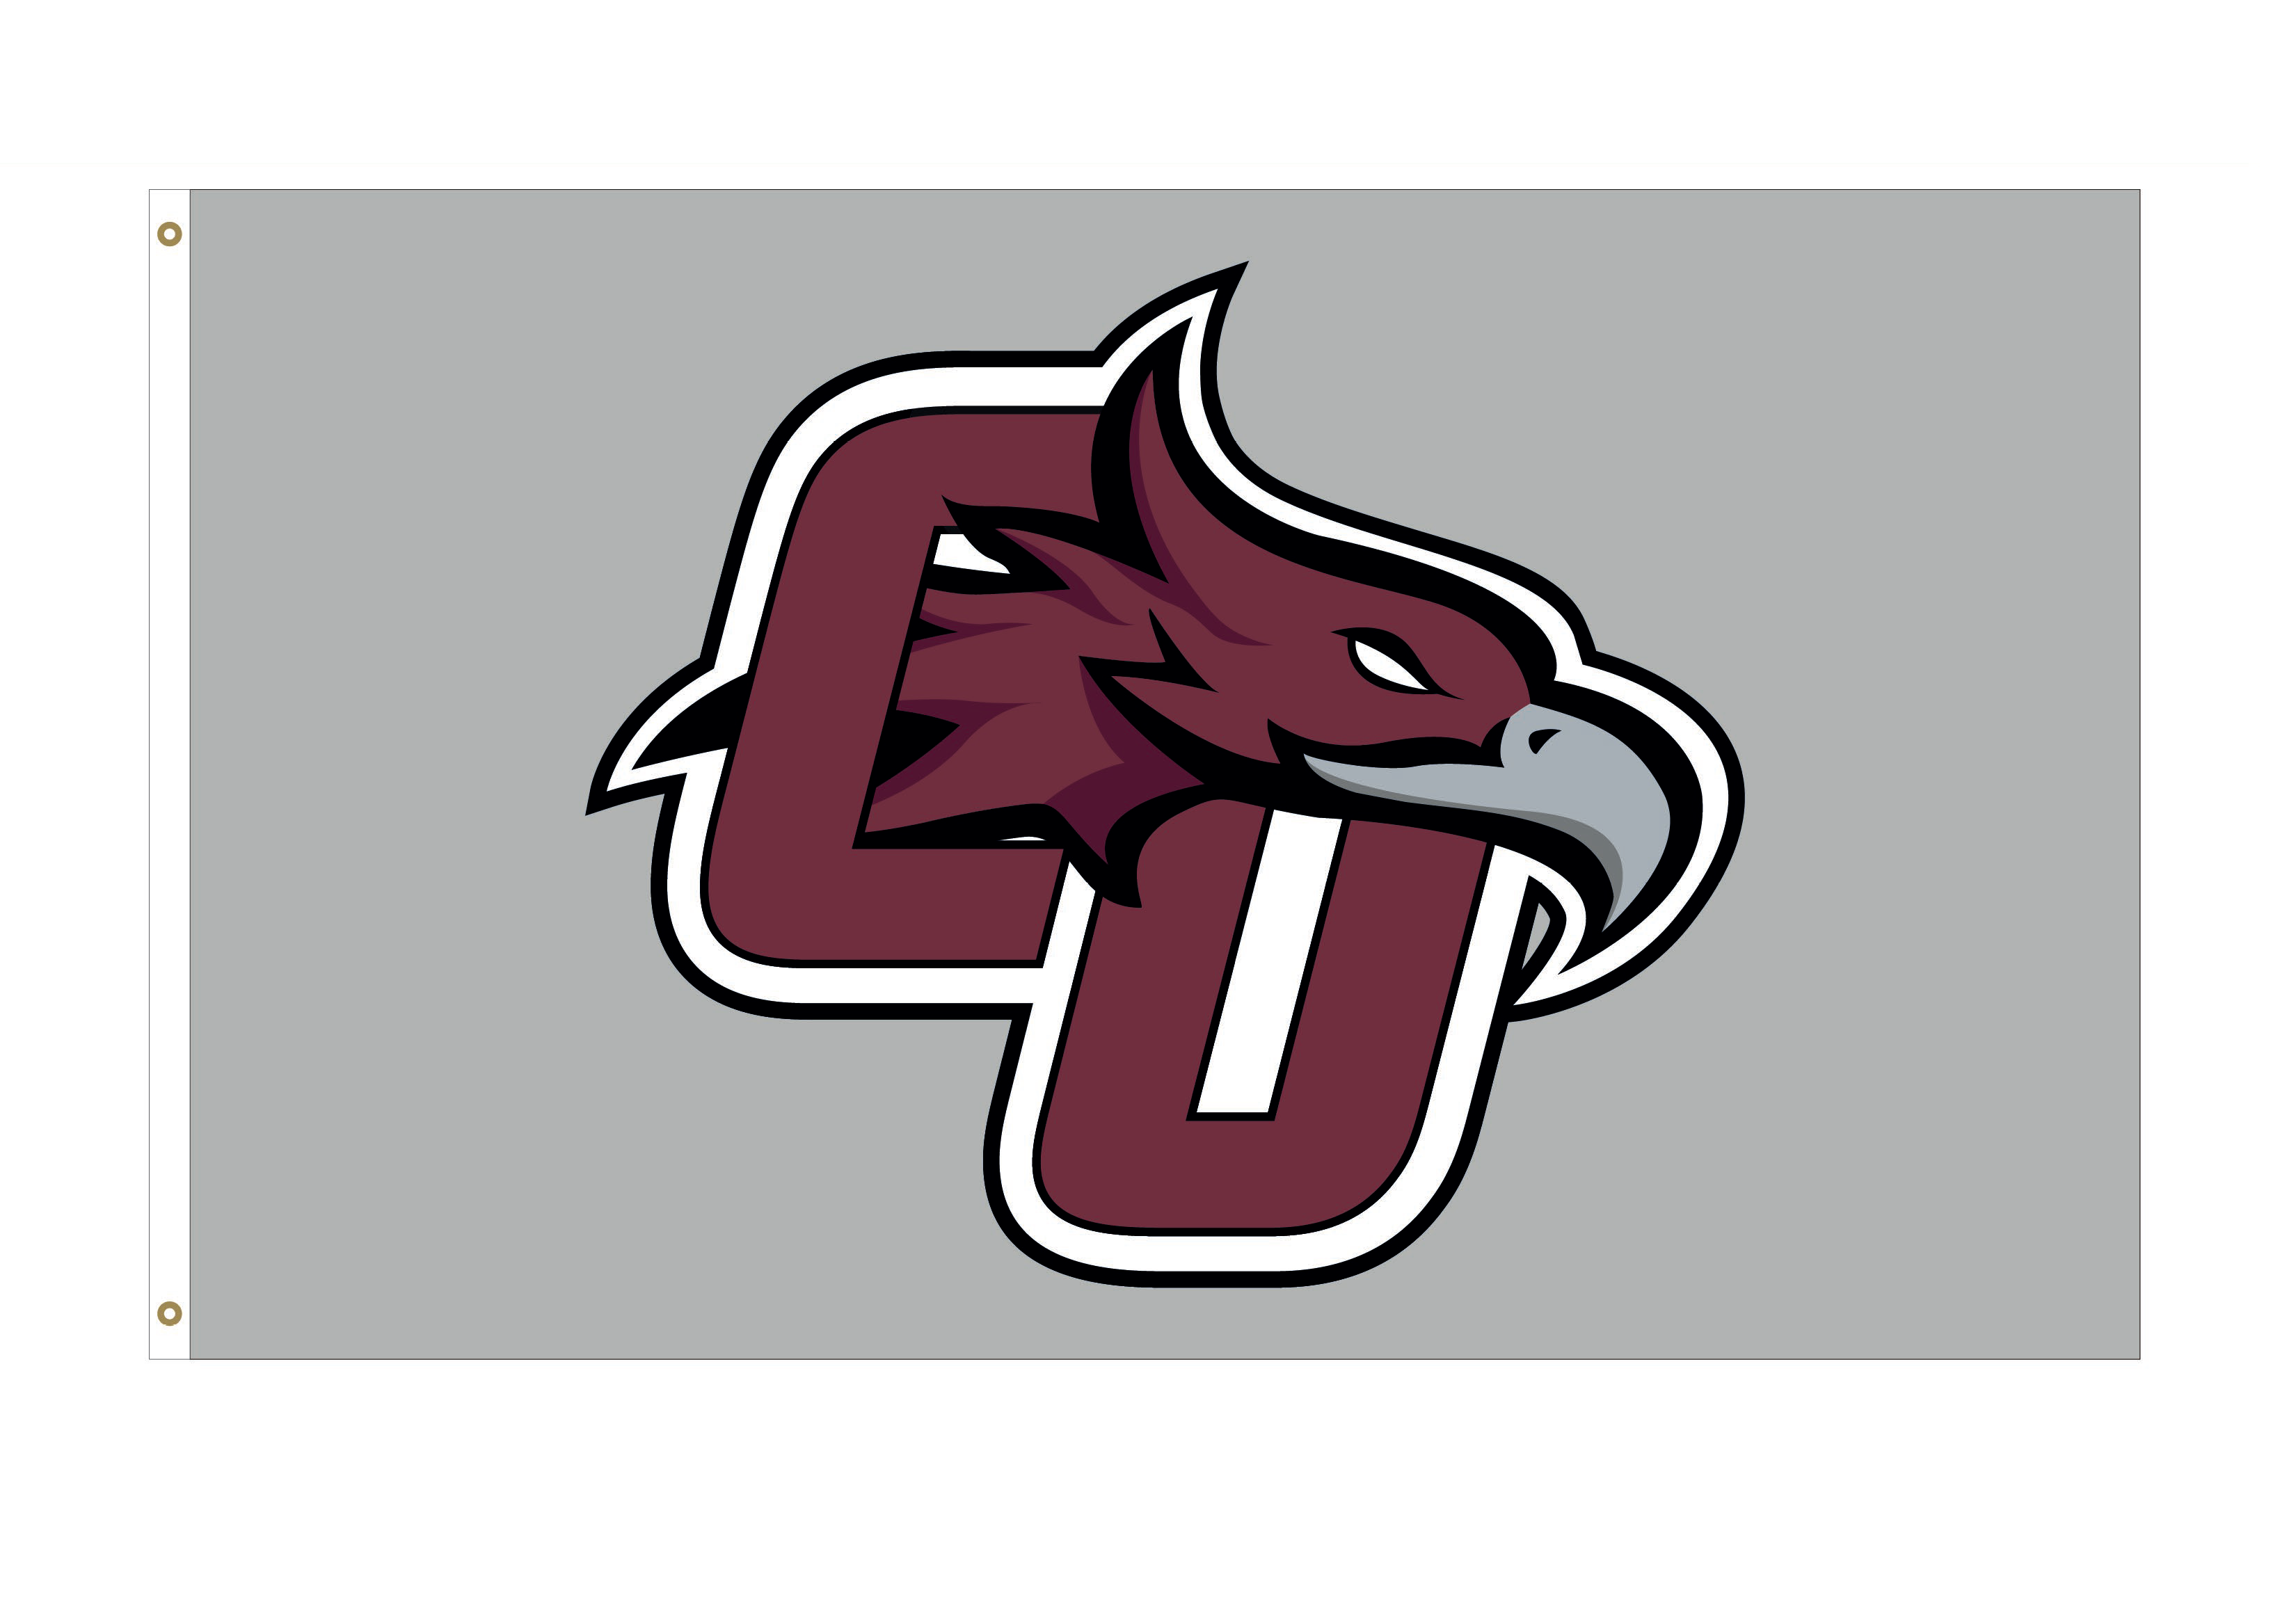 CU Phoenix Logo Deluxe 3x5 Flag